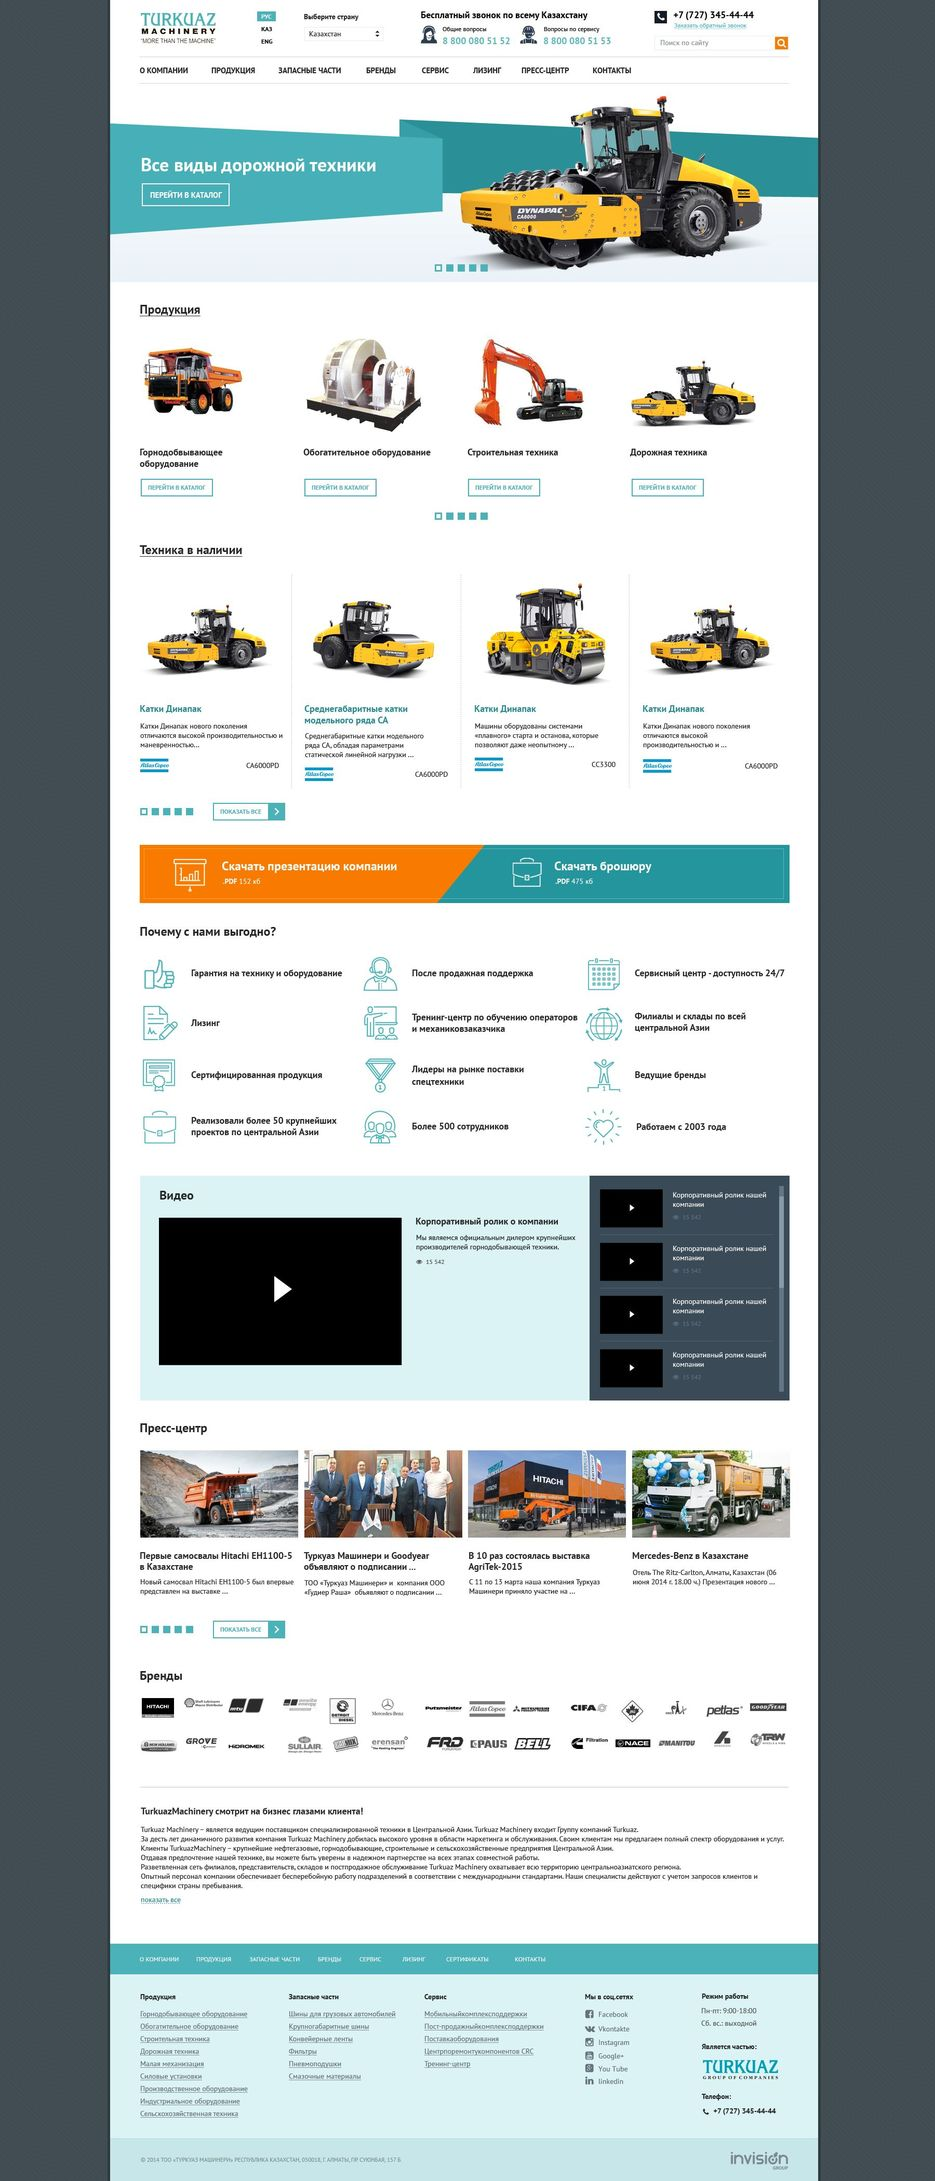 Адаптивная верстка - Turkuaz Machinery